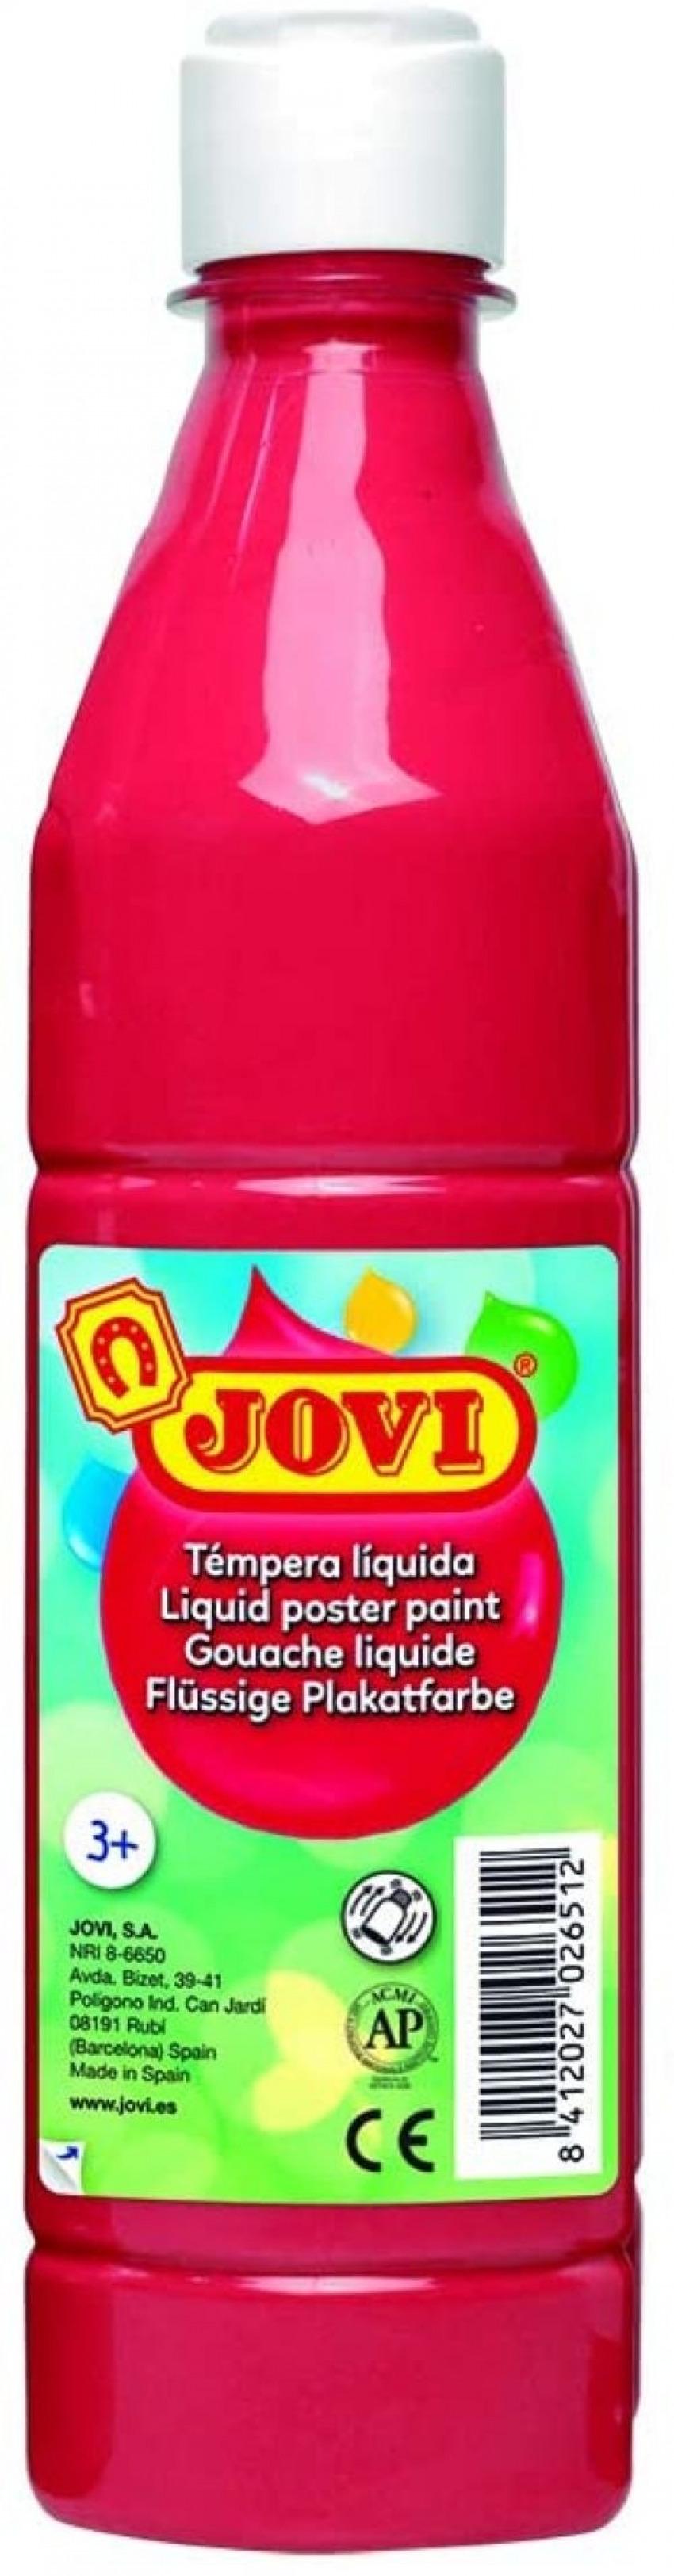 Bote tempera liquida jovi bermellon 500 ml 8412027003674